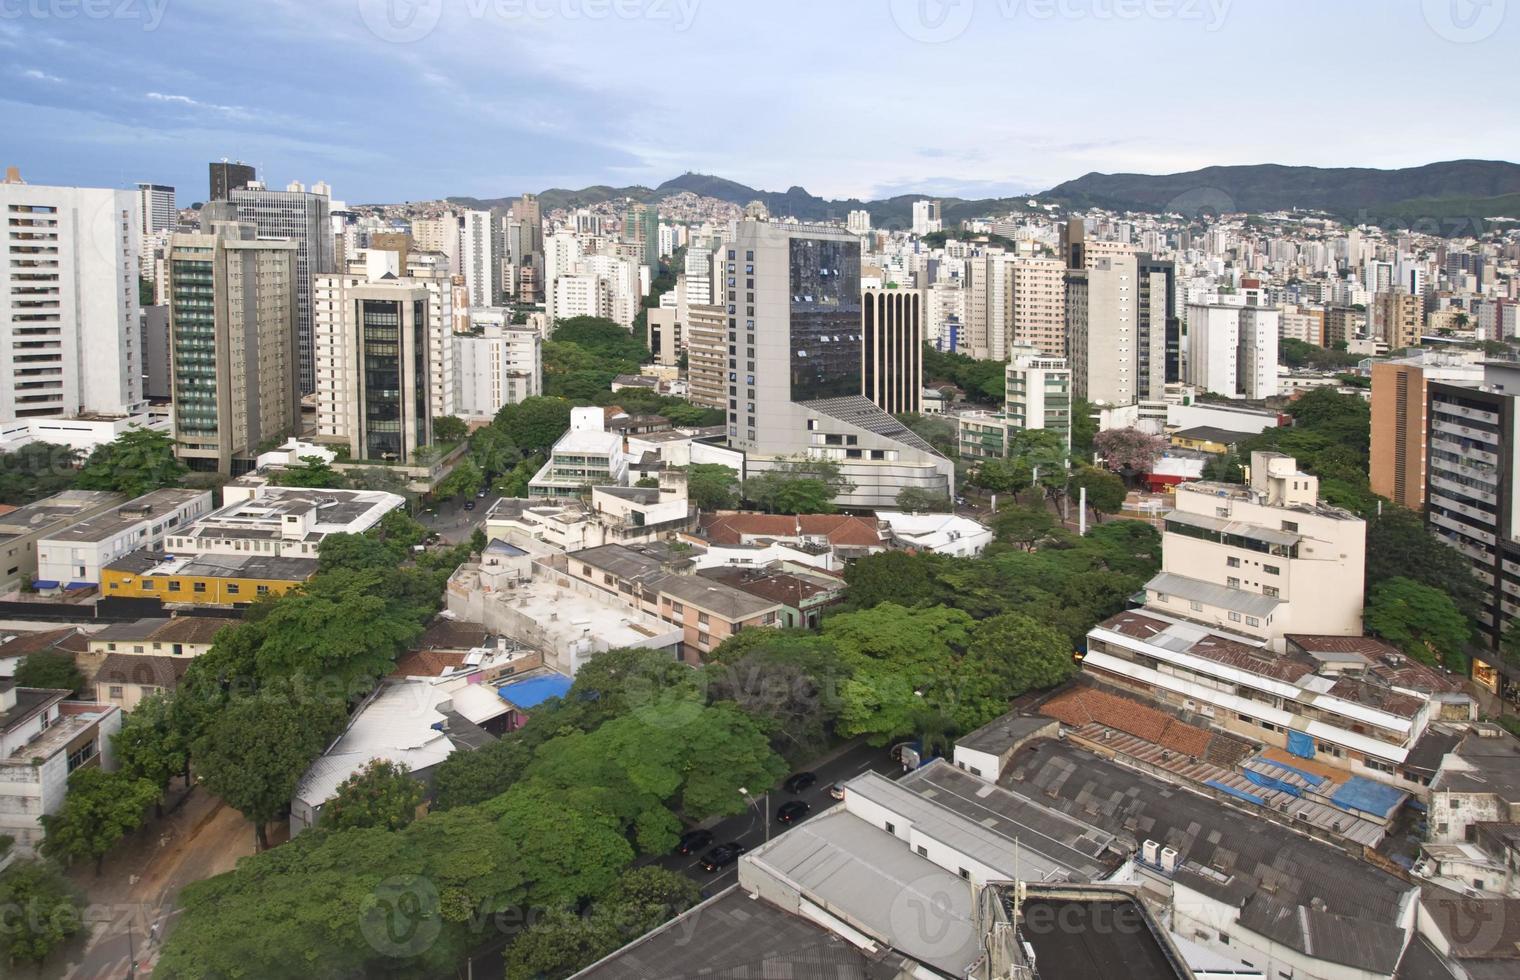 Belo Horizonte photo